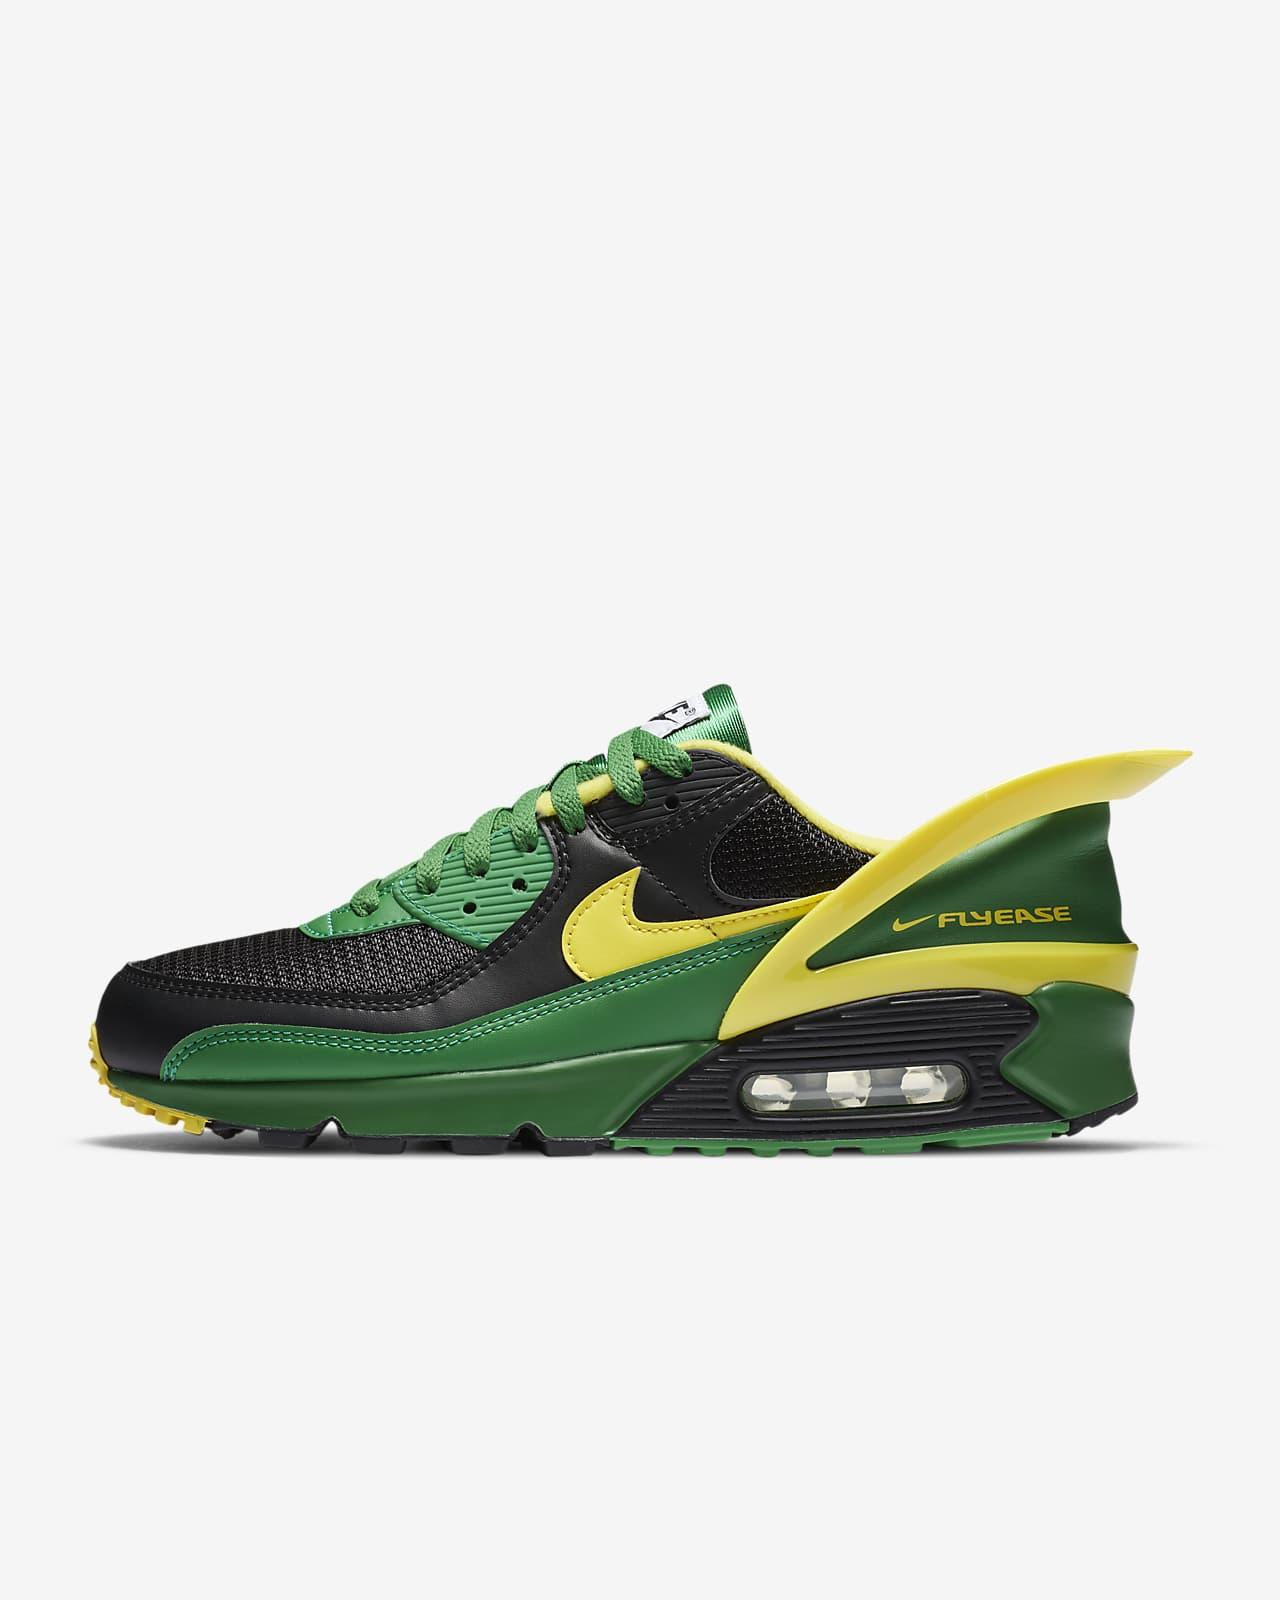 Calzado Nike Air Max 90 FlyEase